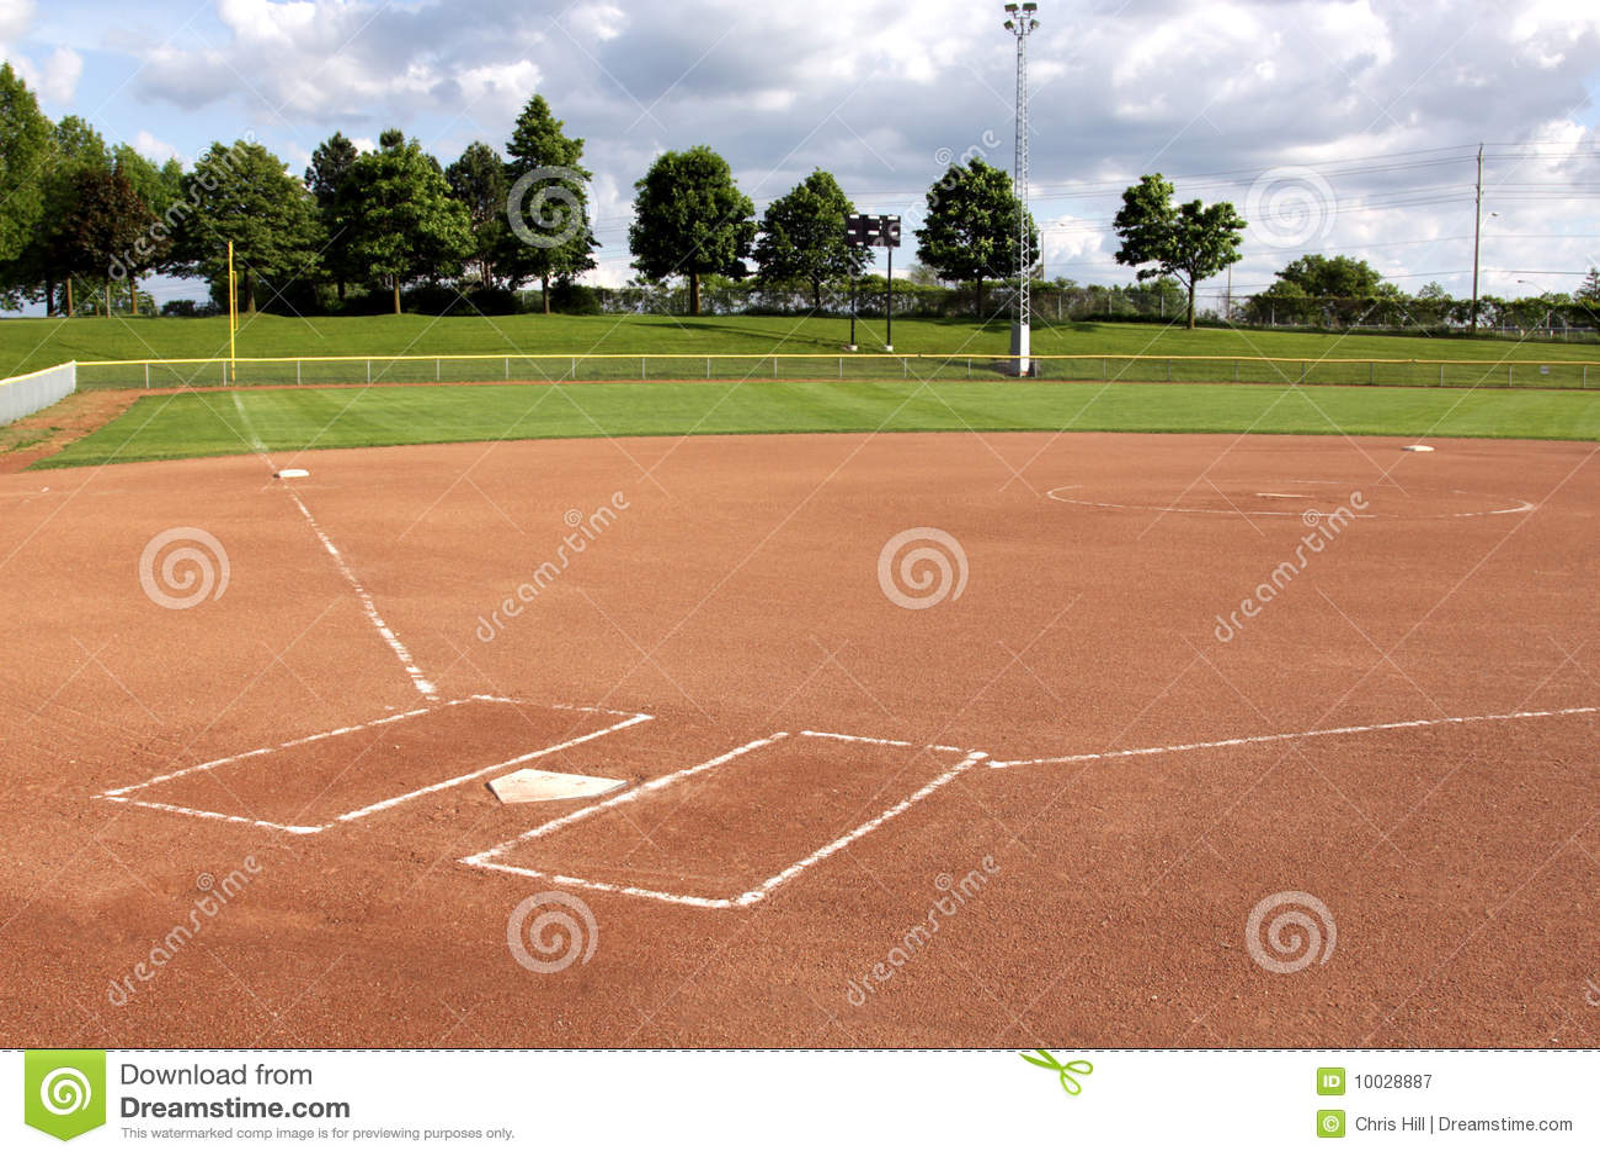 Softball Diamond Royalty Free Stock Photography - Image: 10028887